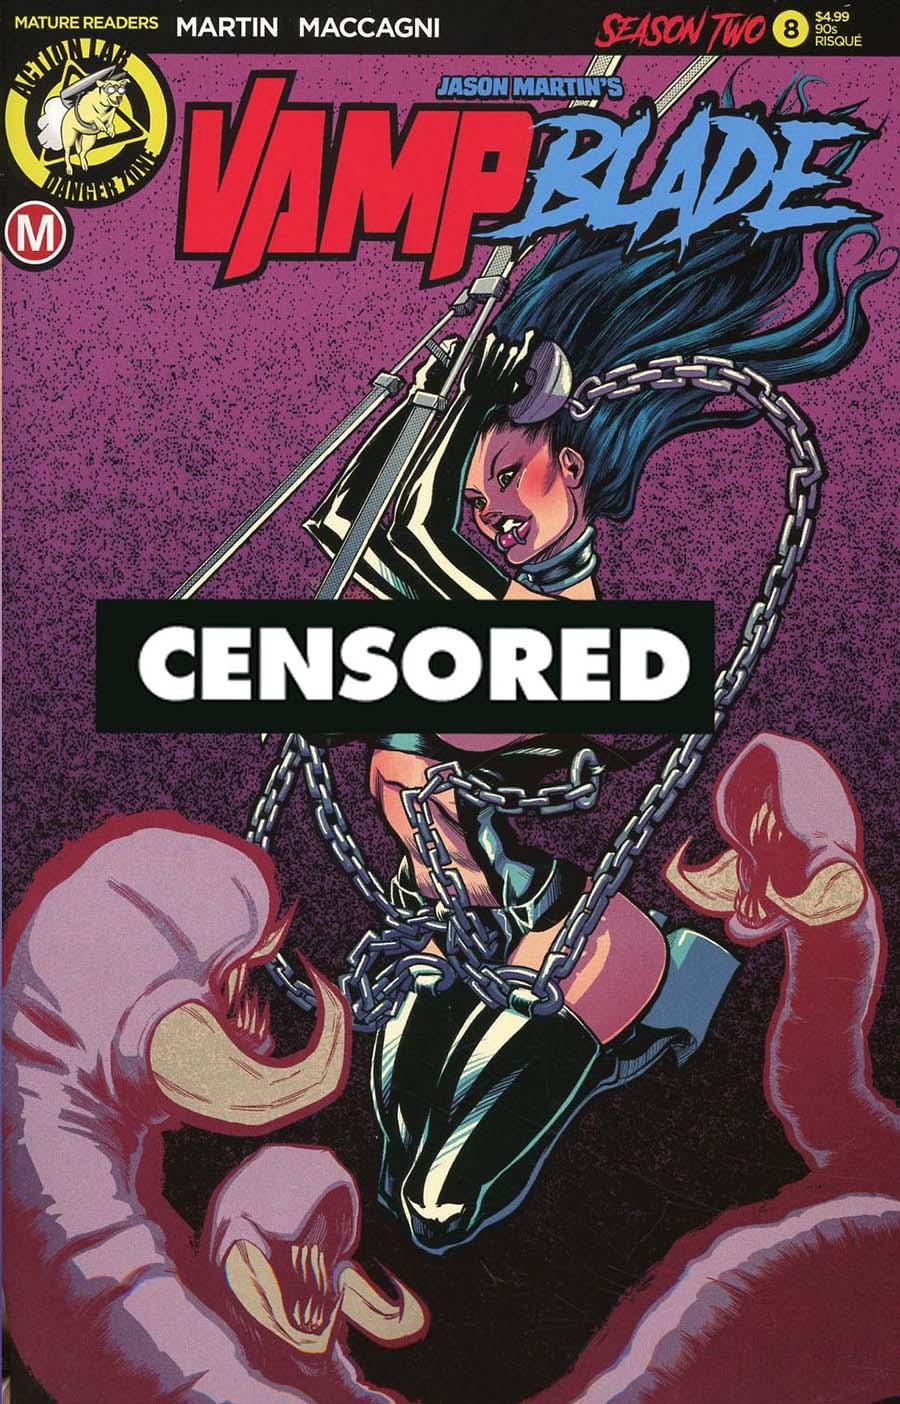 Vampblade Season 2 #8 Cover F Variant Timothy Weaver 1990s Risque Cover